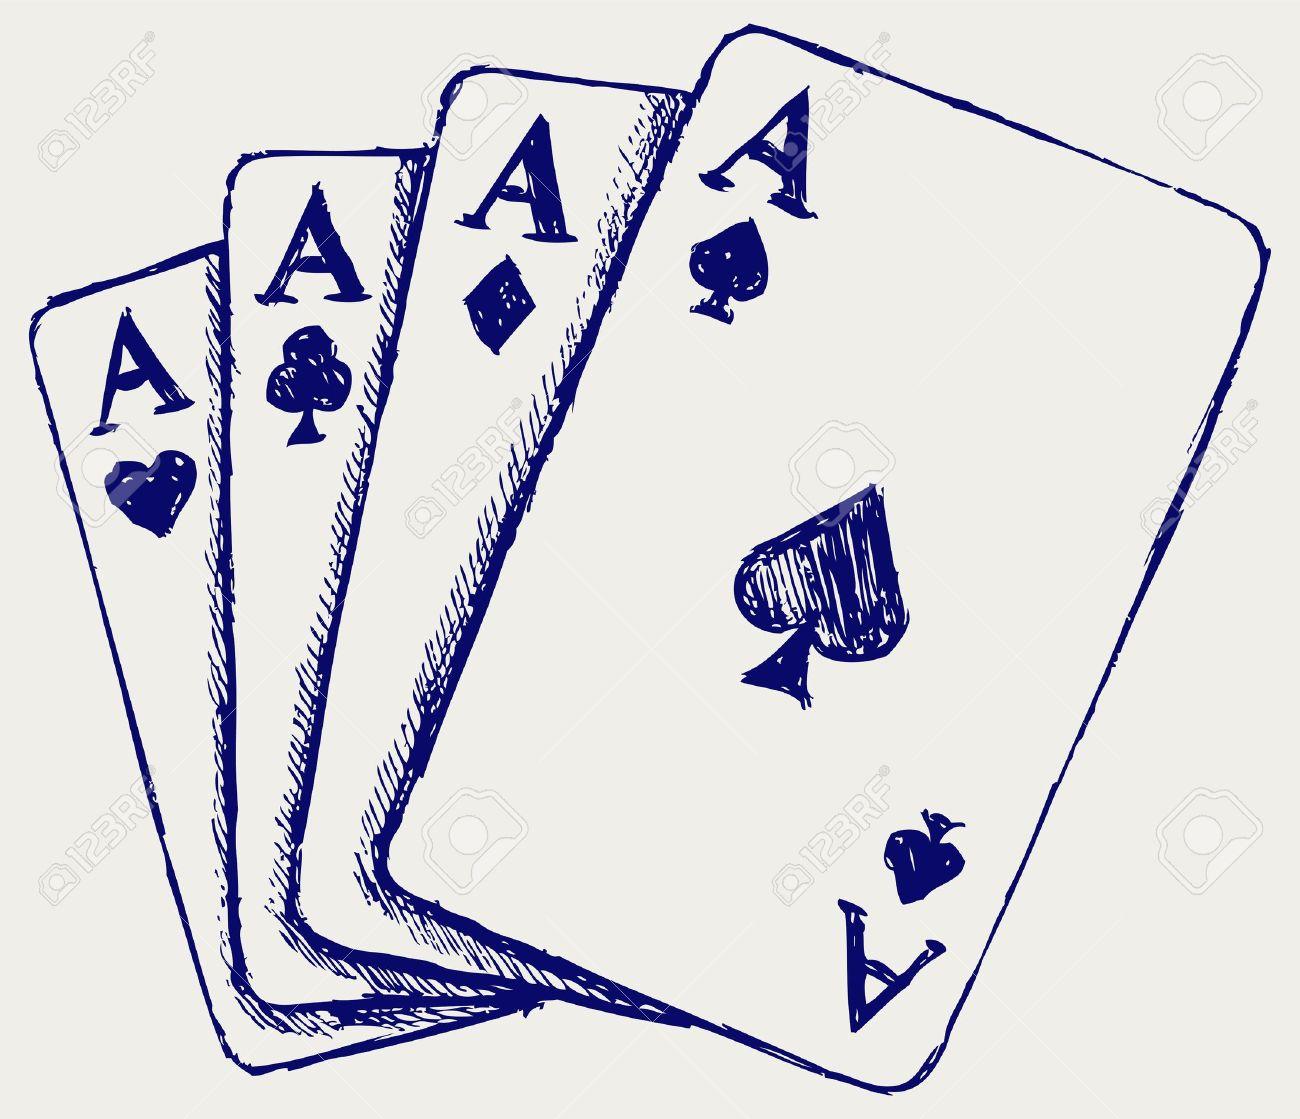 Gambling. Sketch Stock Vector - 15831702